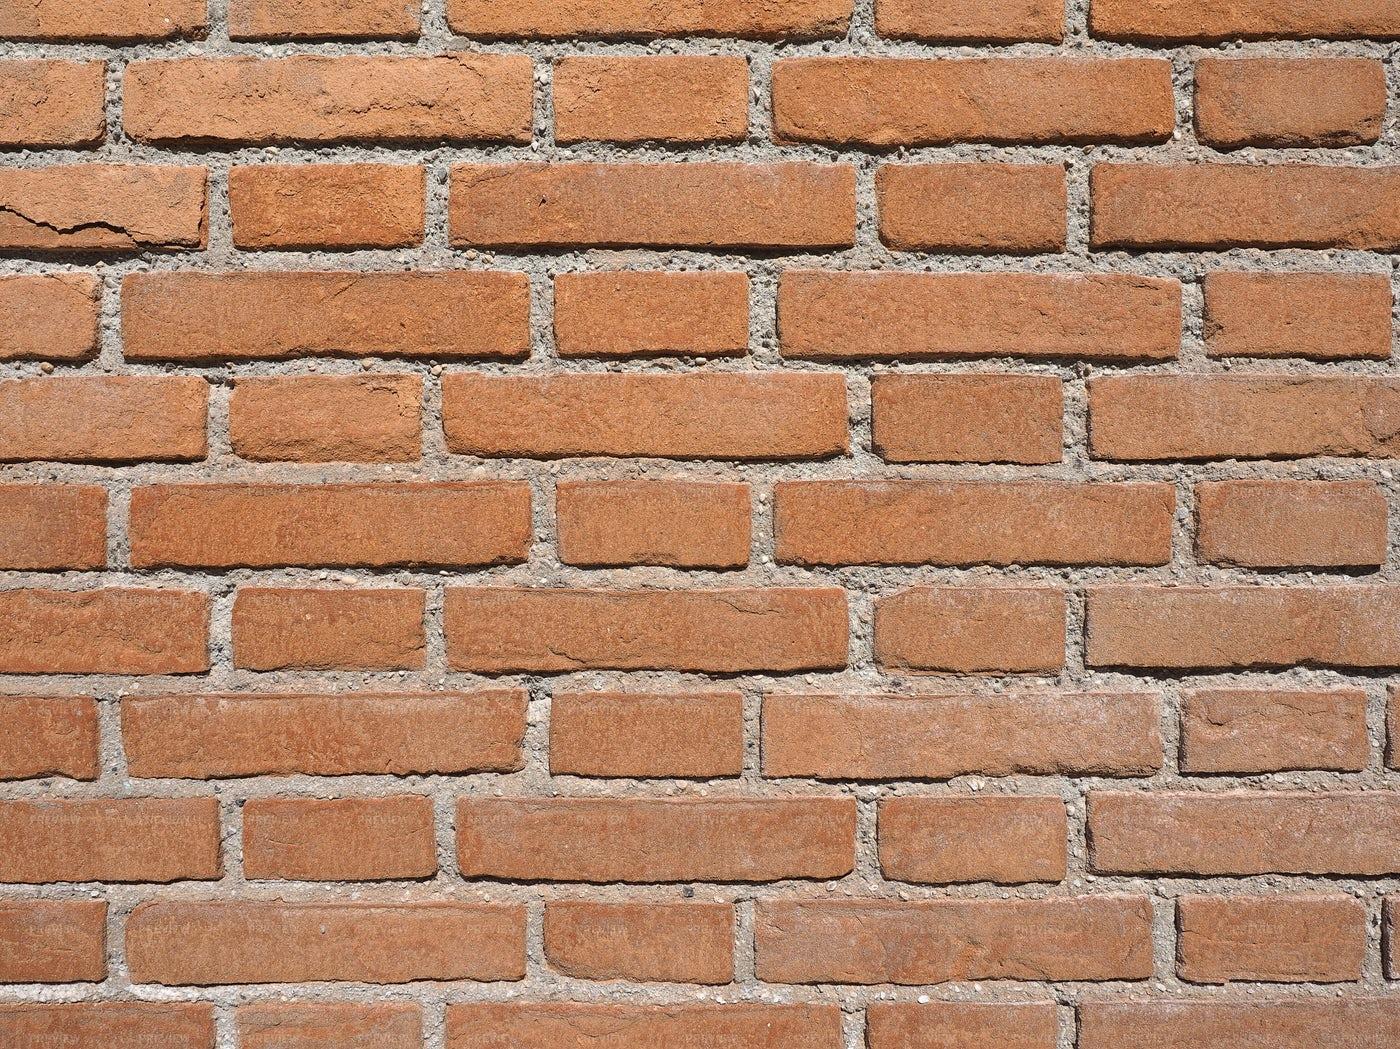 Brick Wall Background: Stock Photos